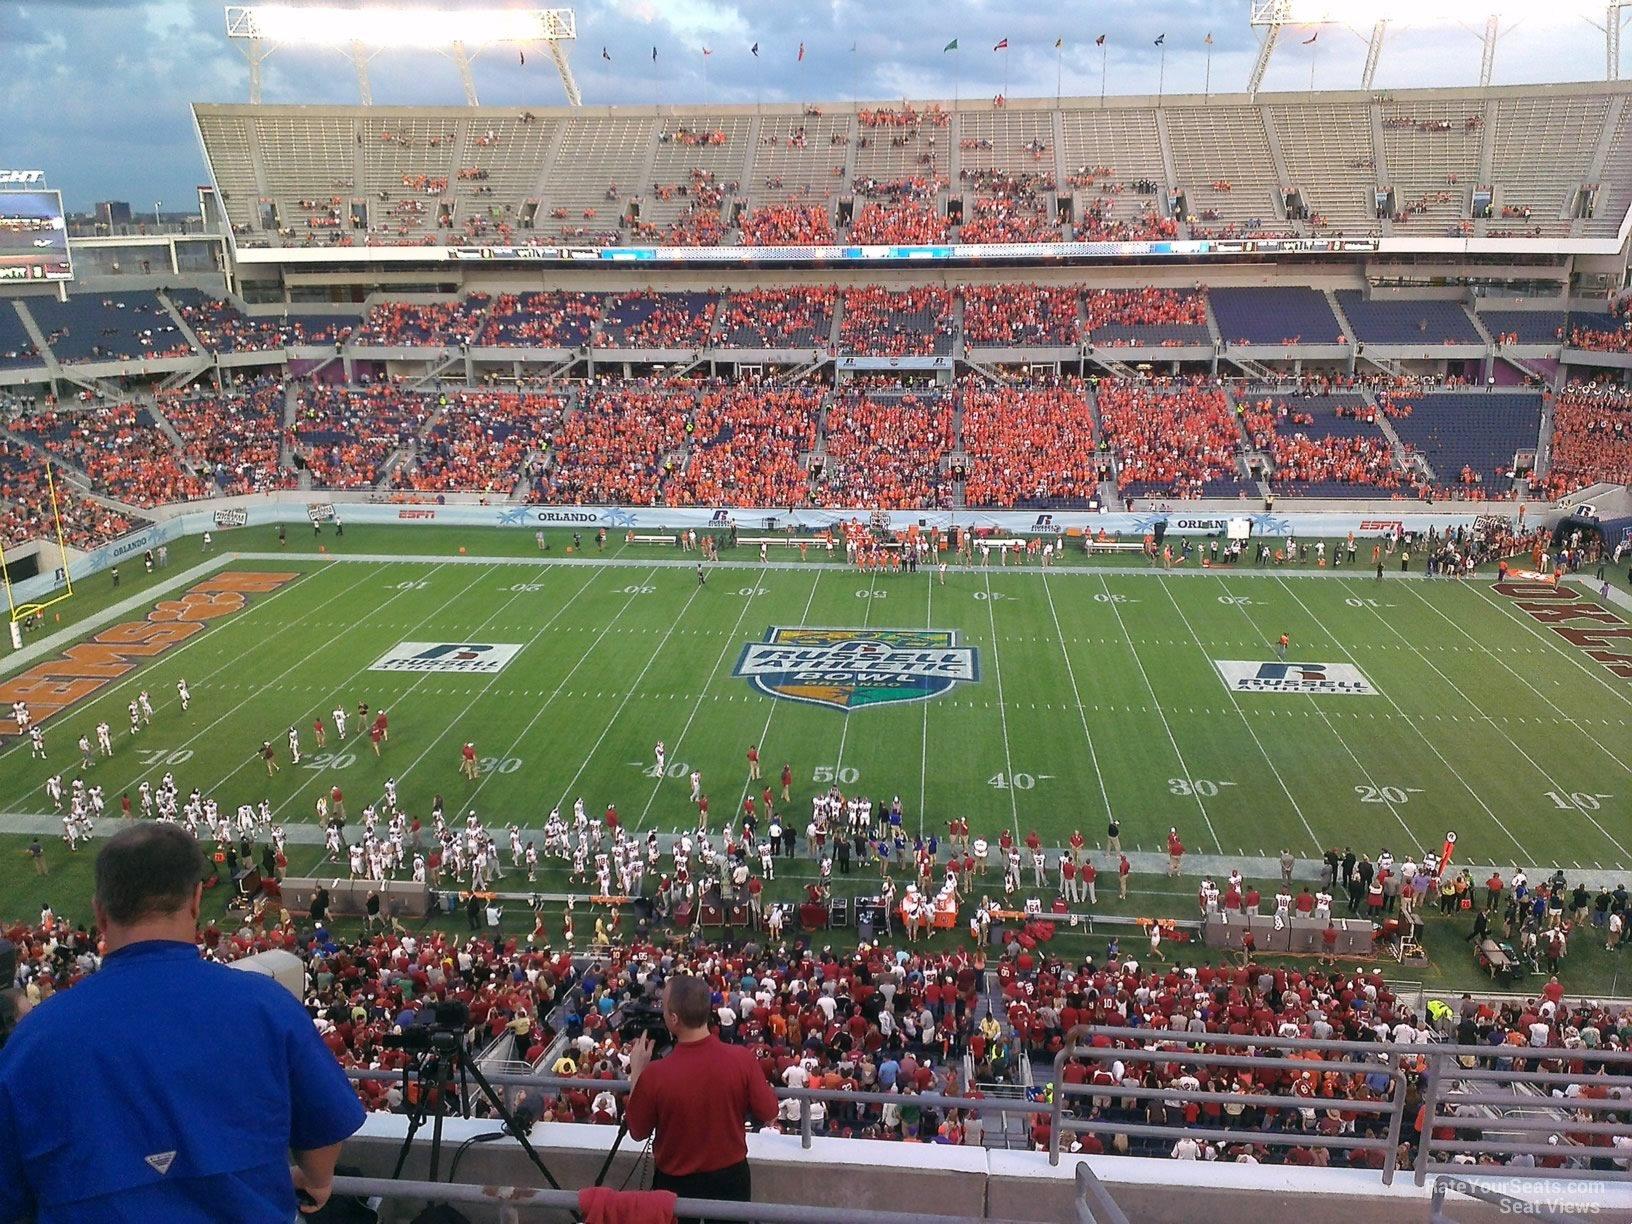 Orlando Citrus Bowl Seating Chart With Rows Brokeasshome Com